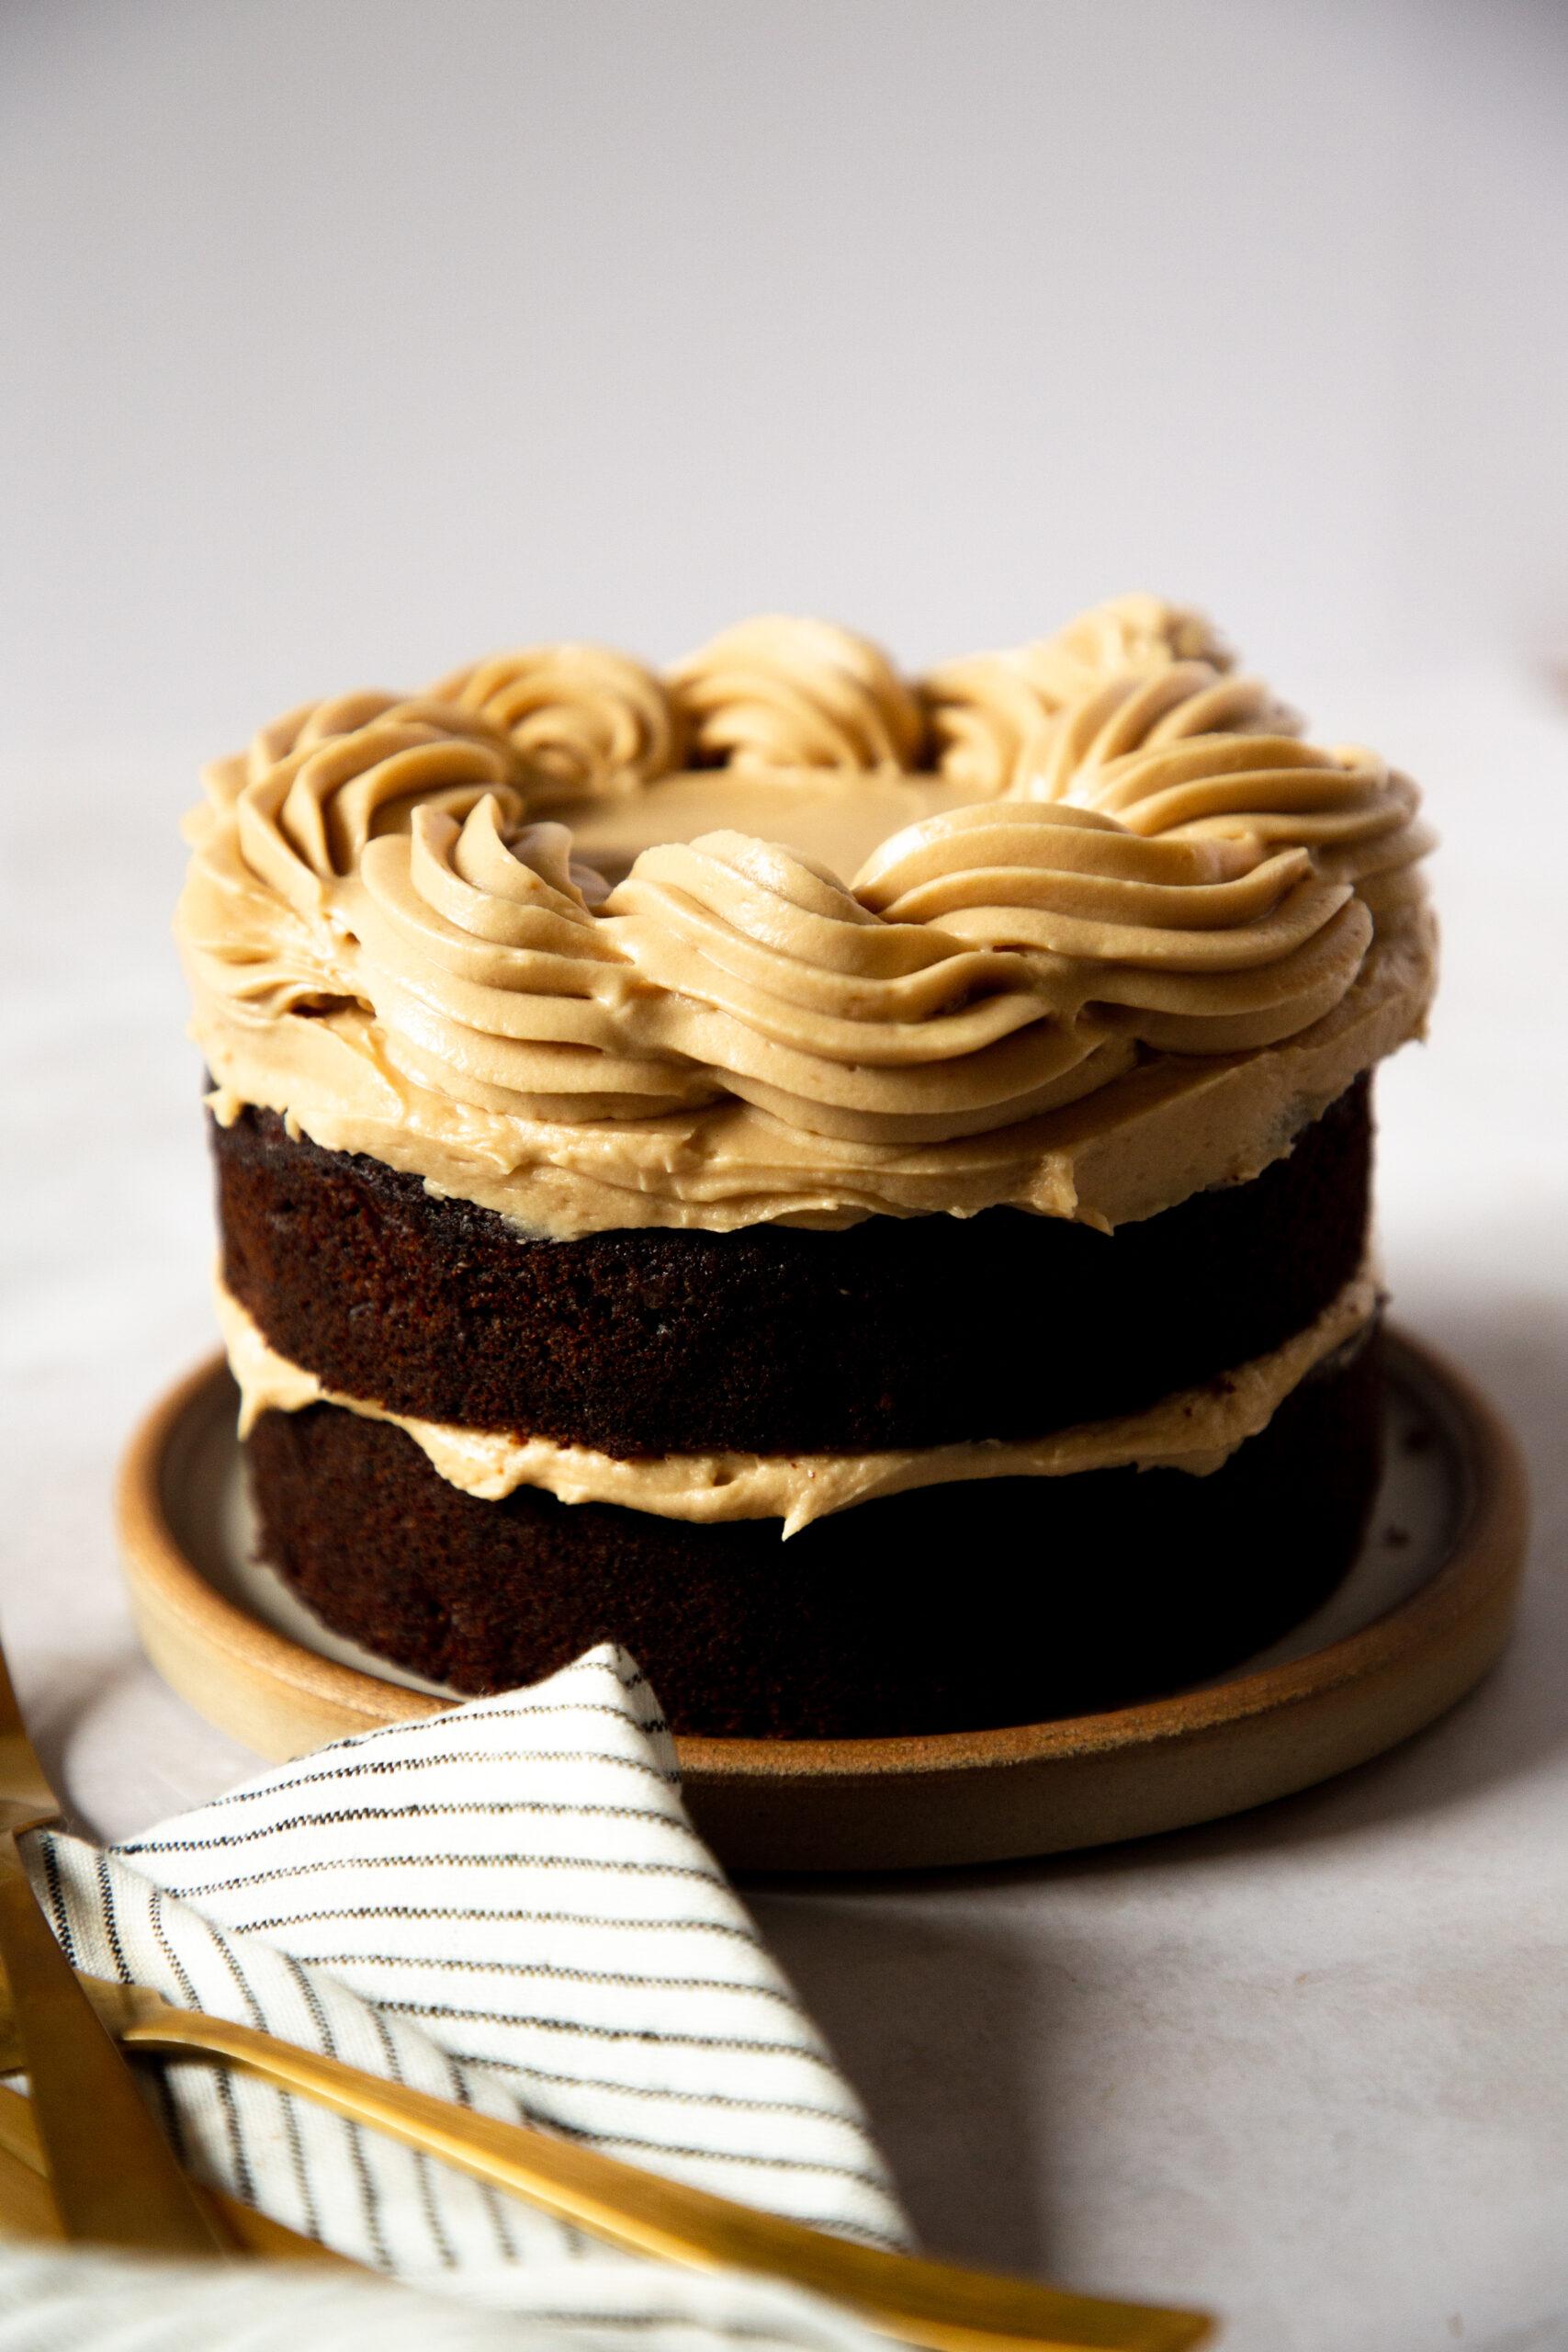 Caramelised banana and coffee cake